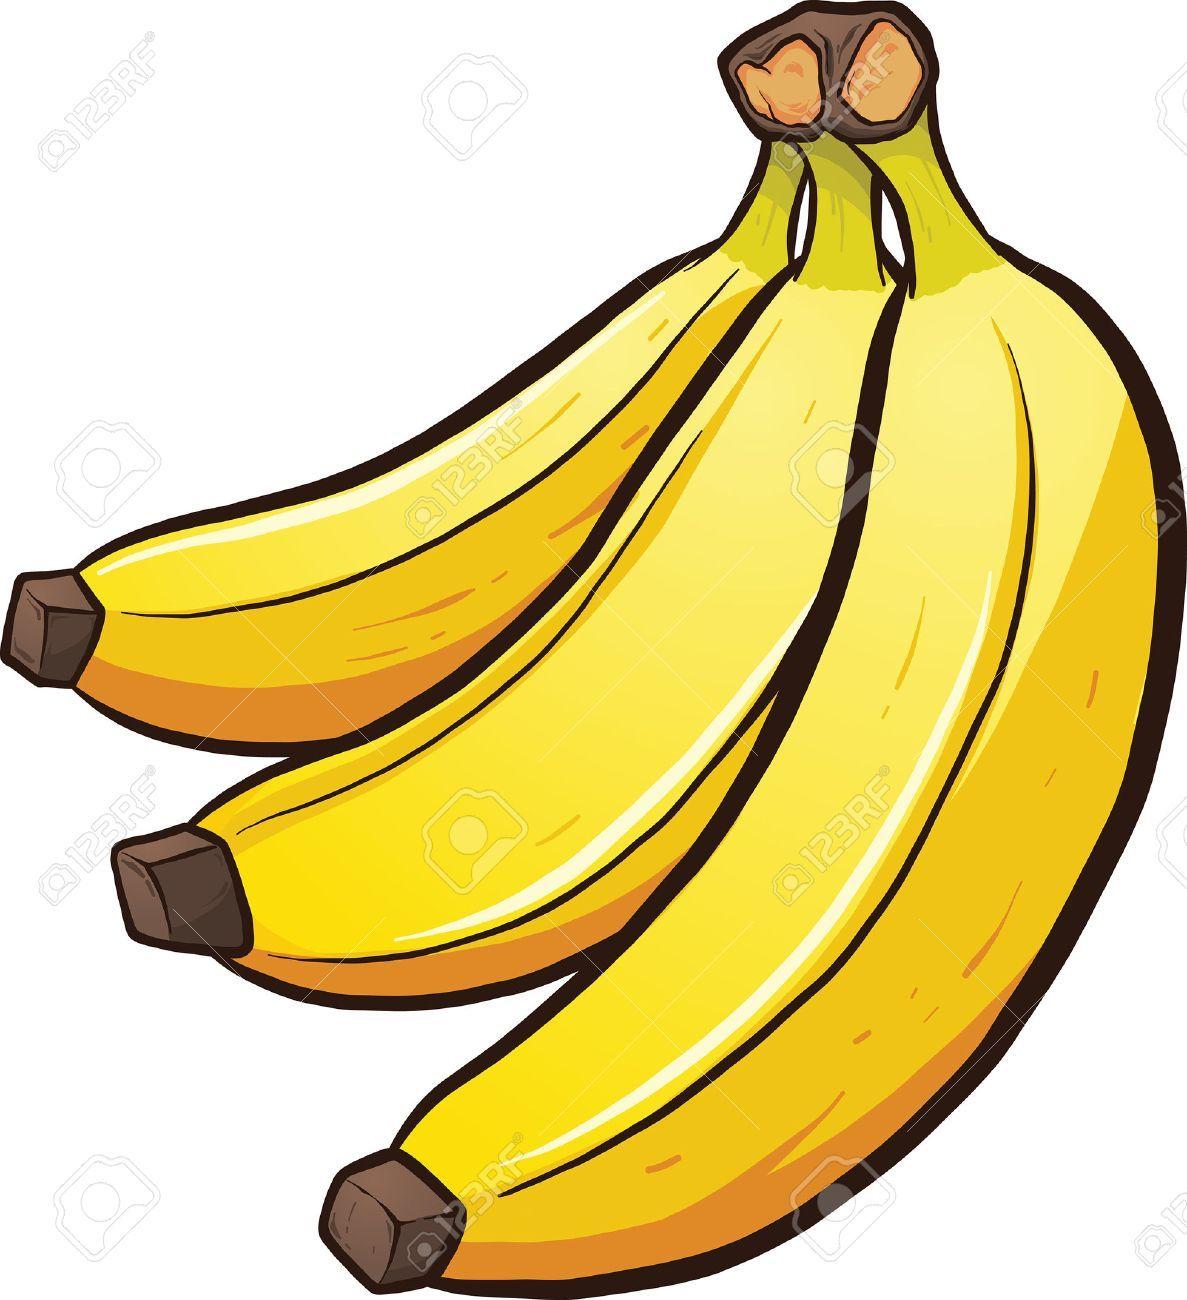 Banane clipart 2 » Clipart Portal.